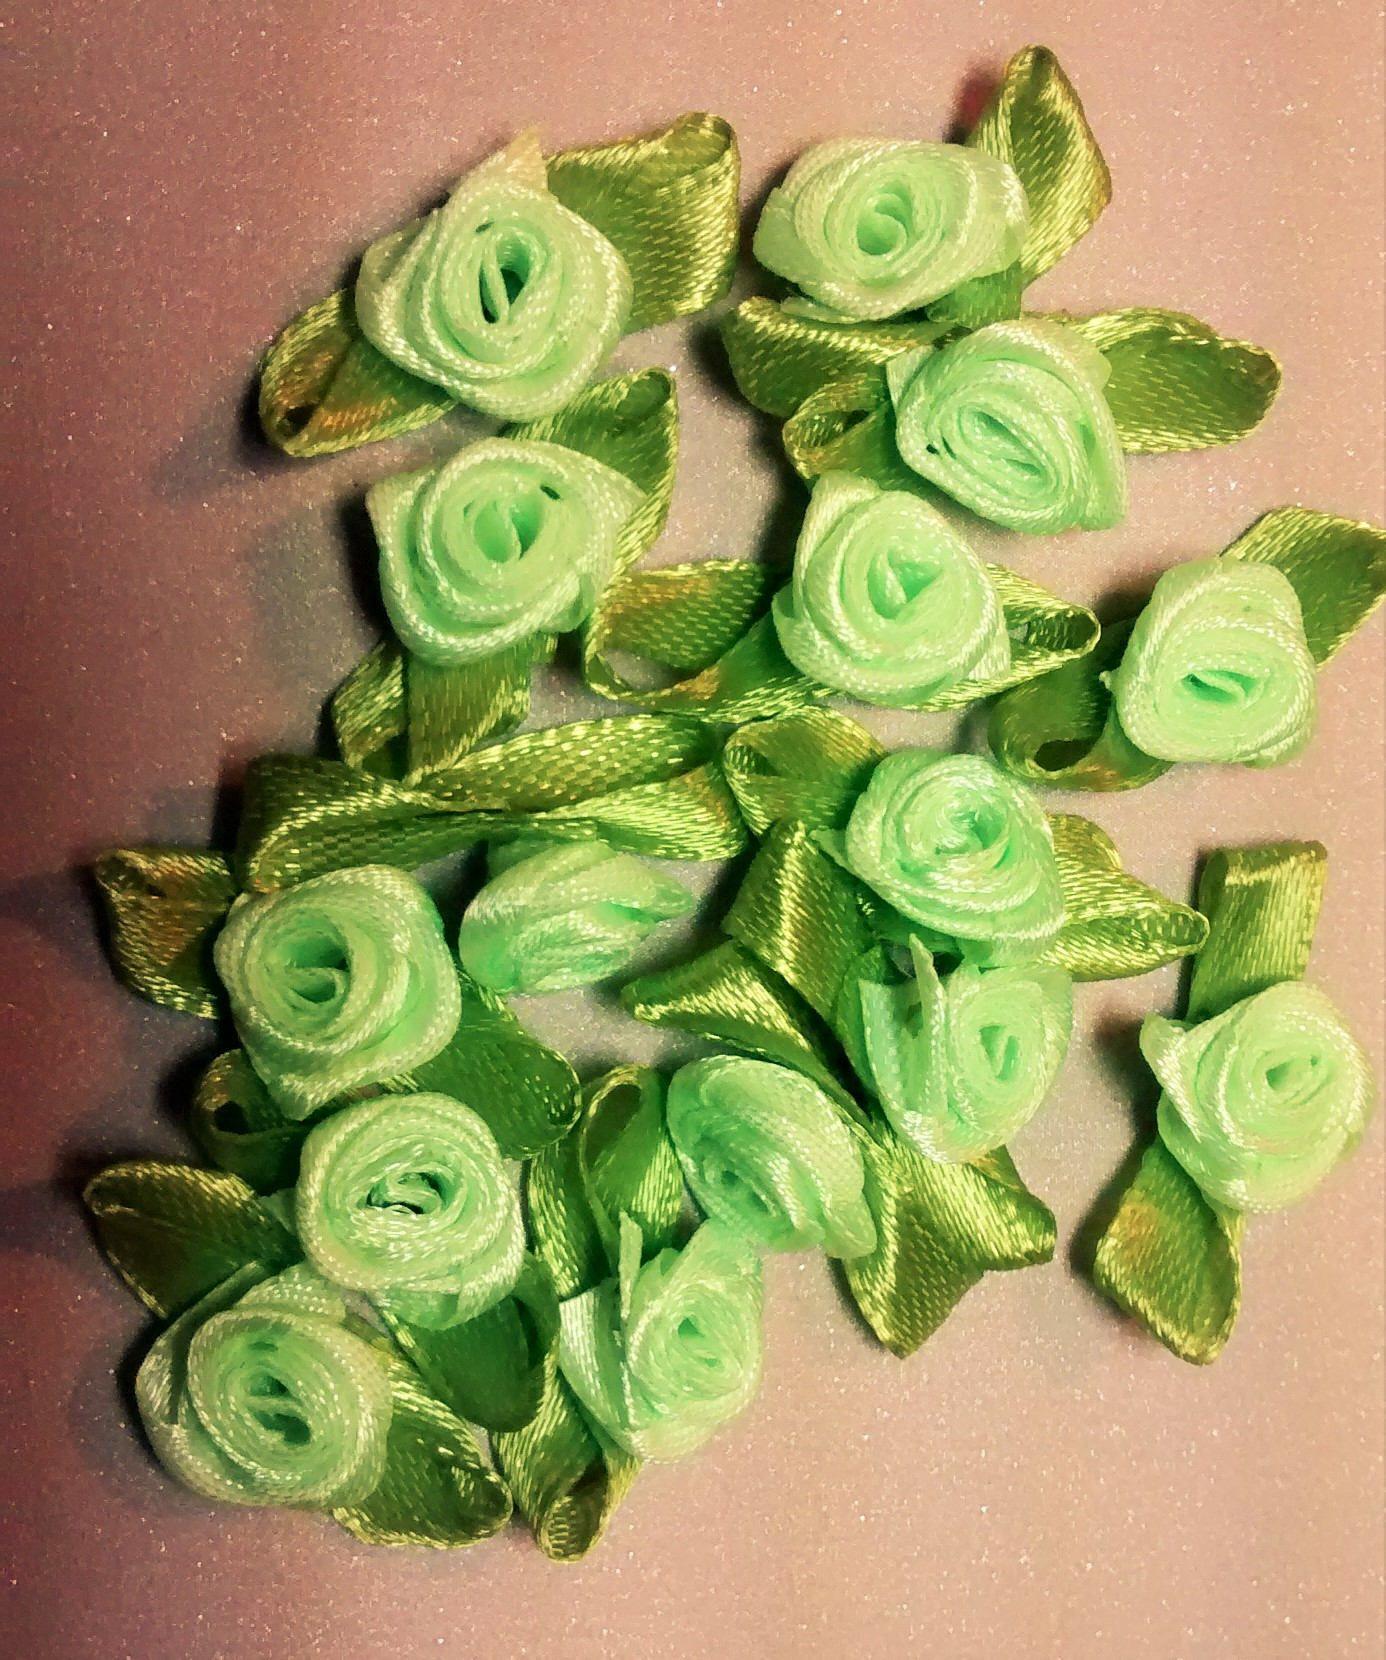 RR-106, $1.25, Light Green Ribbon Roses